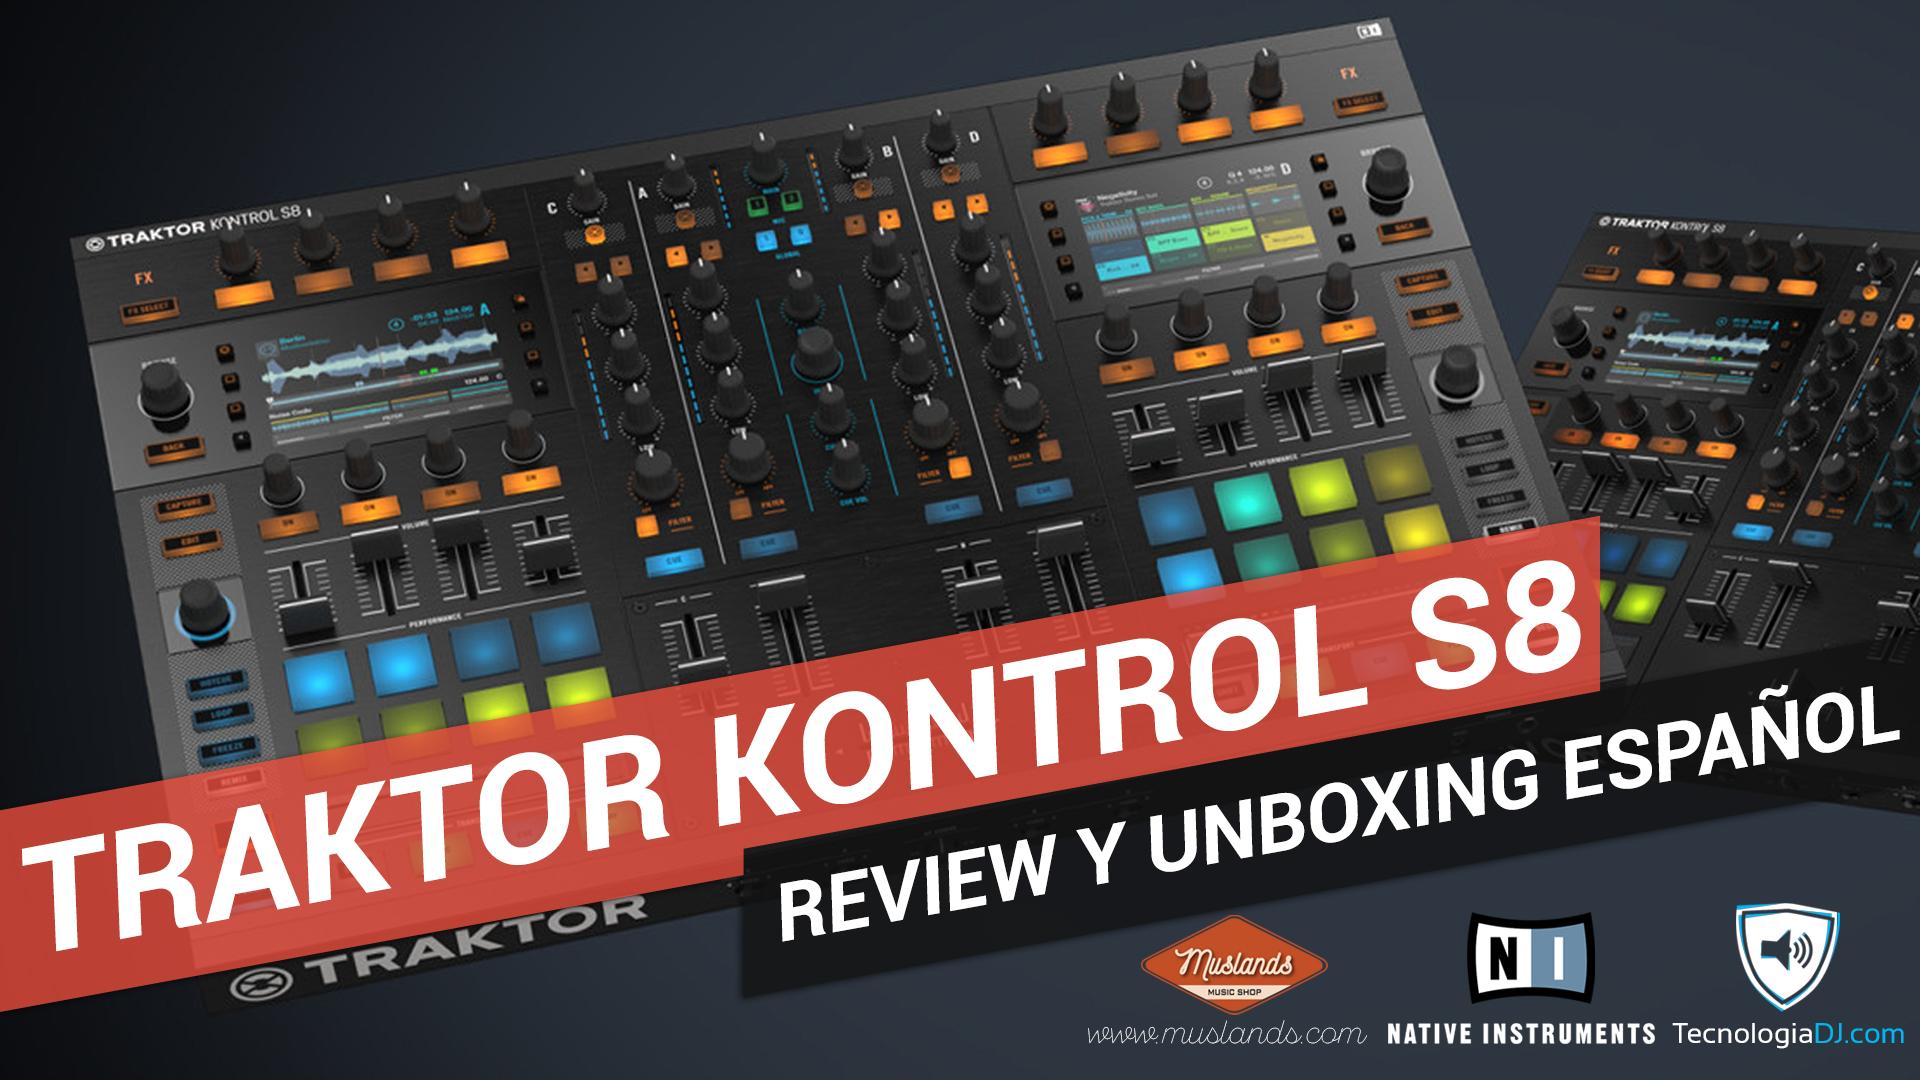 Review y unboxing en español Traktor Kontrol S8